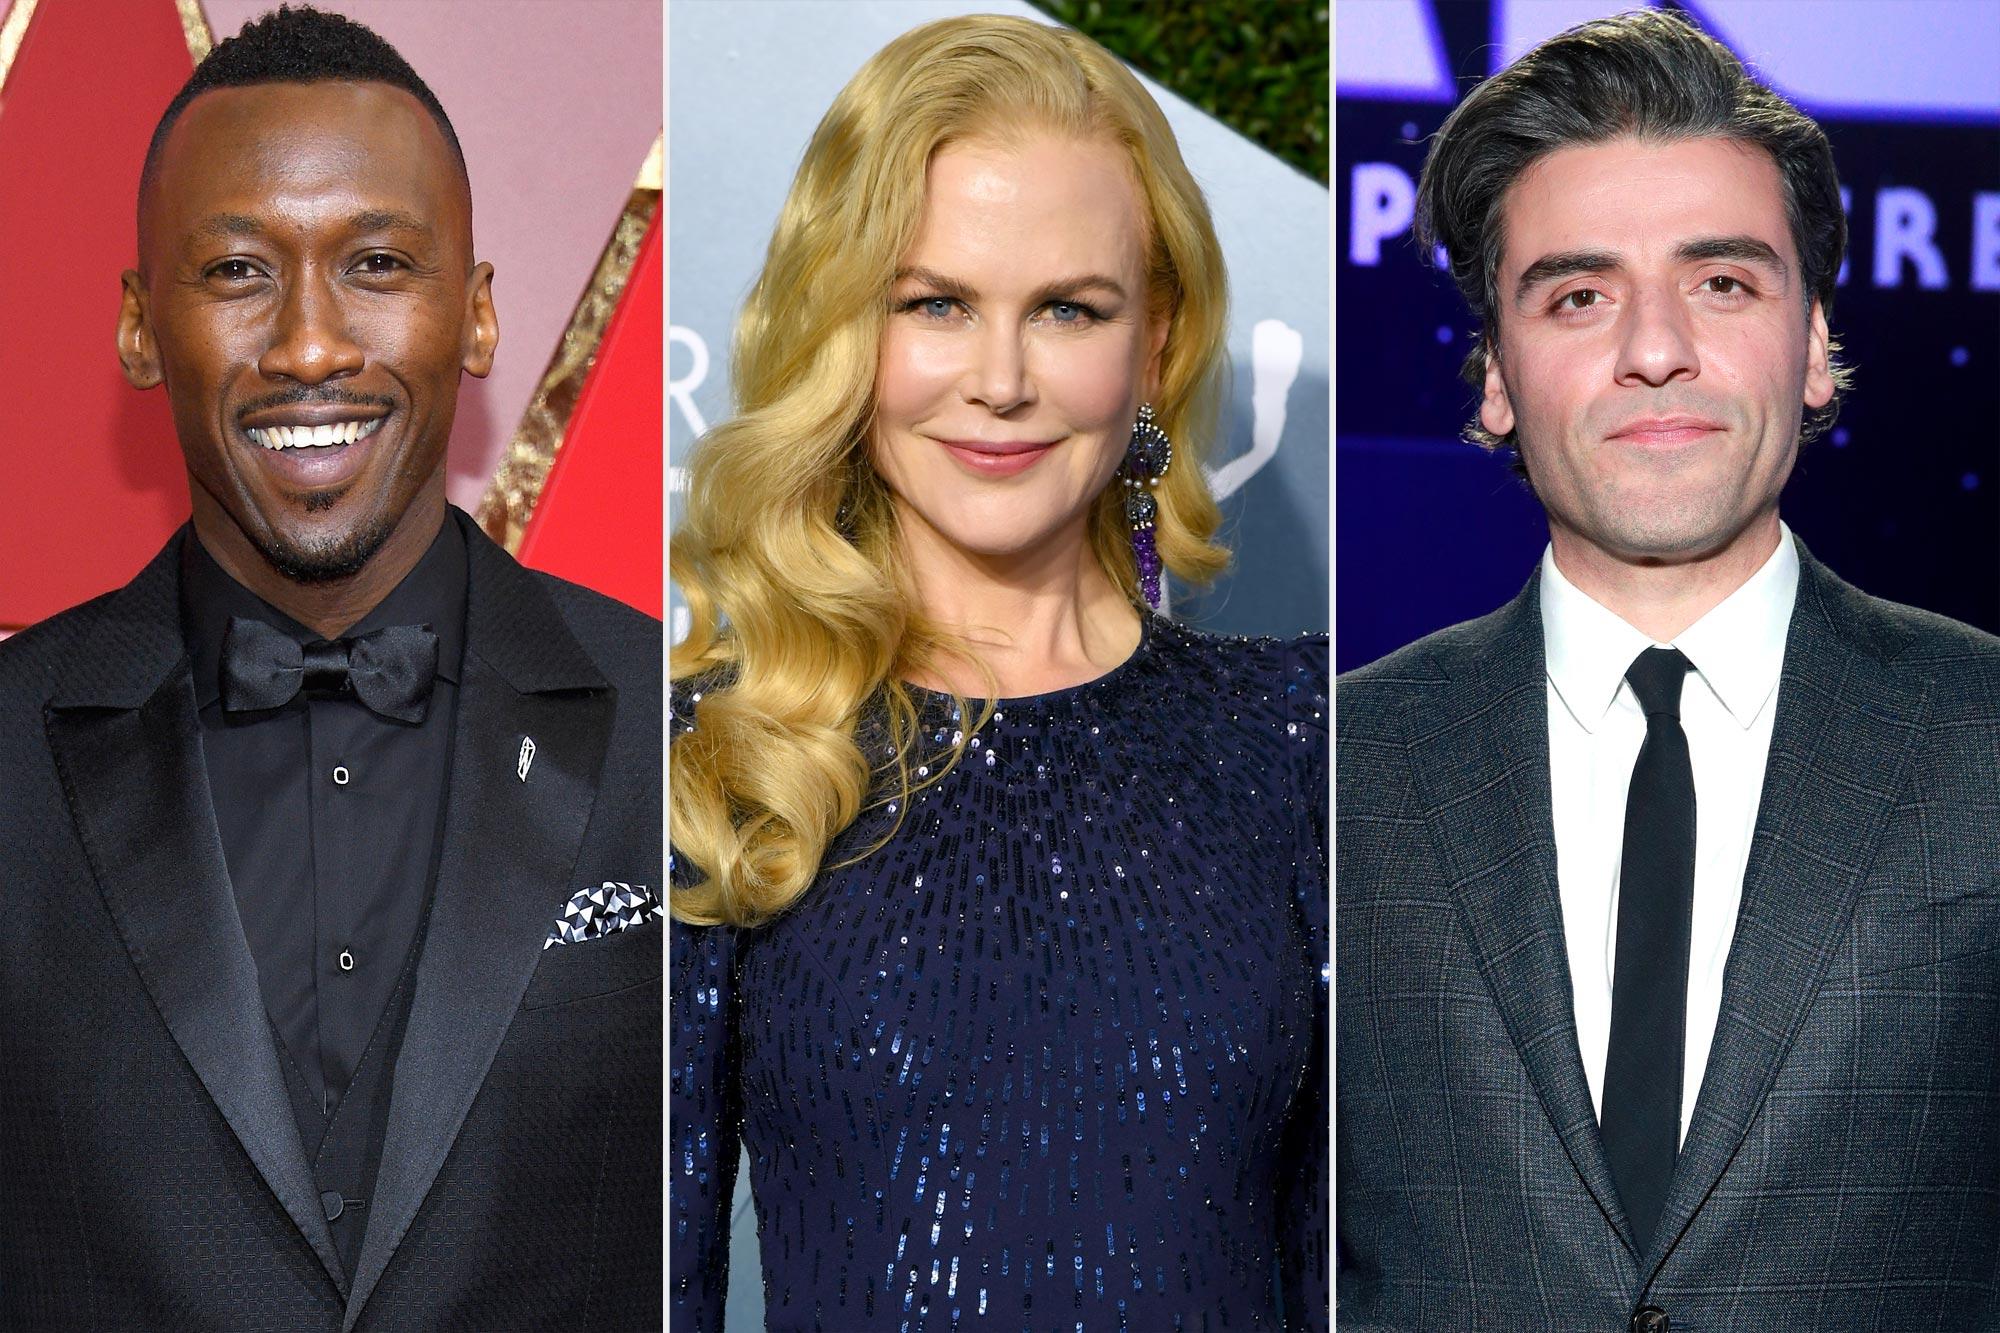 MahMahershala Ali, Nicole Kidman, and Oscar Isaac